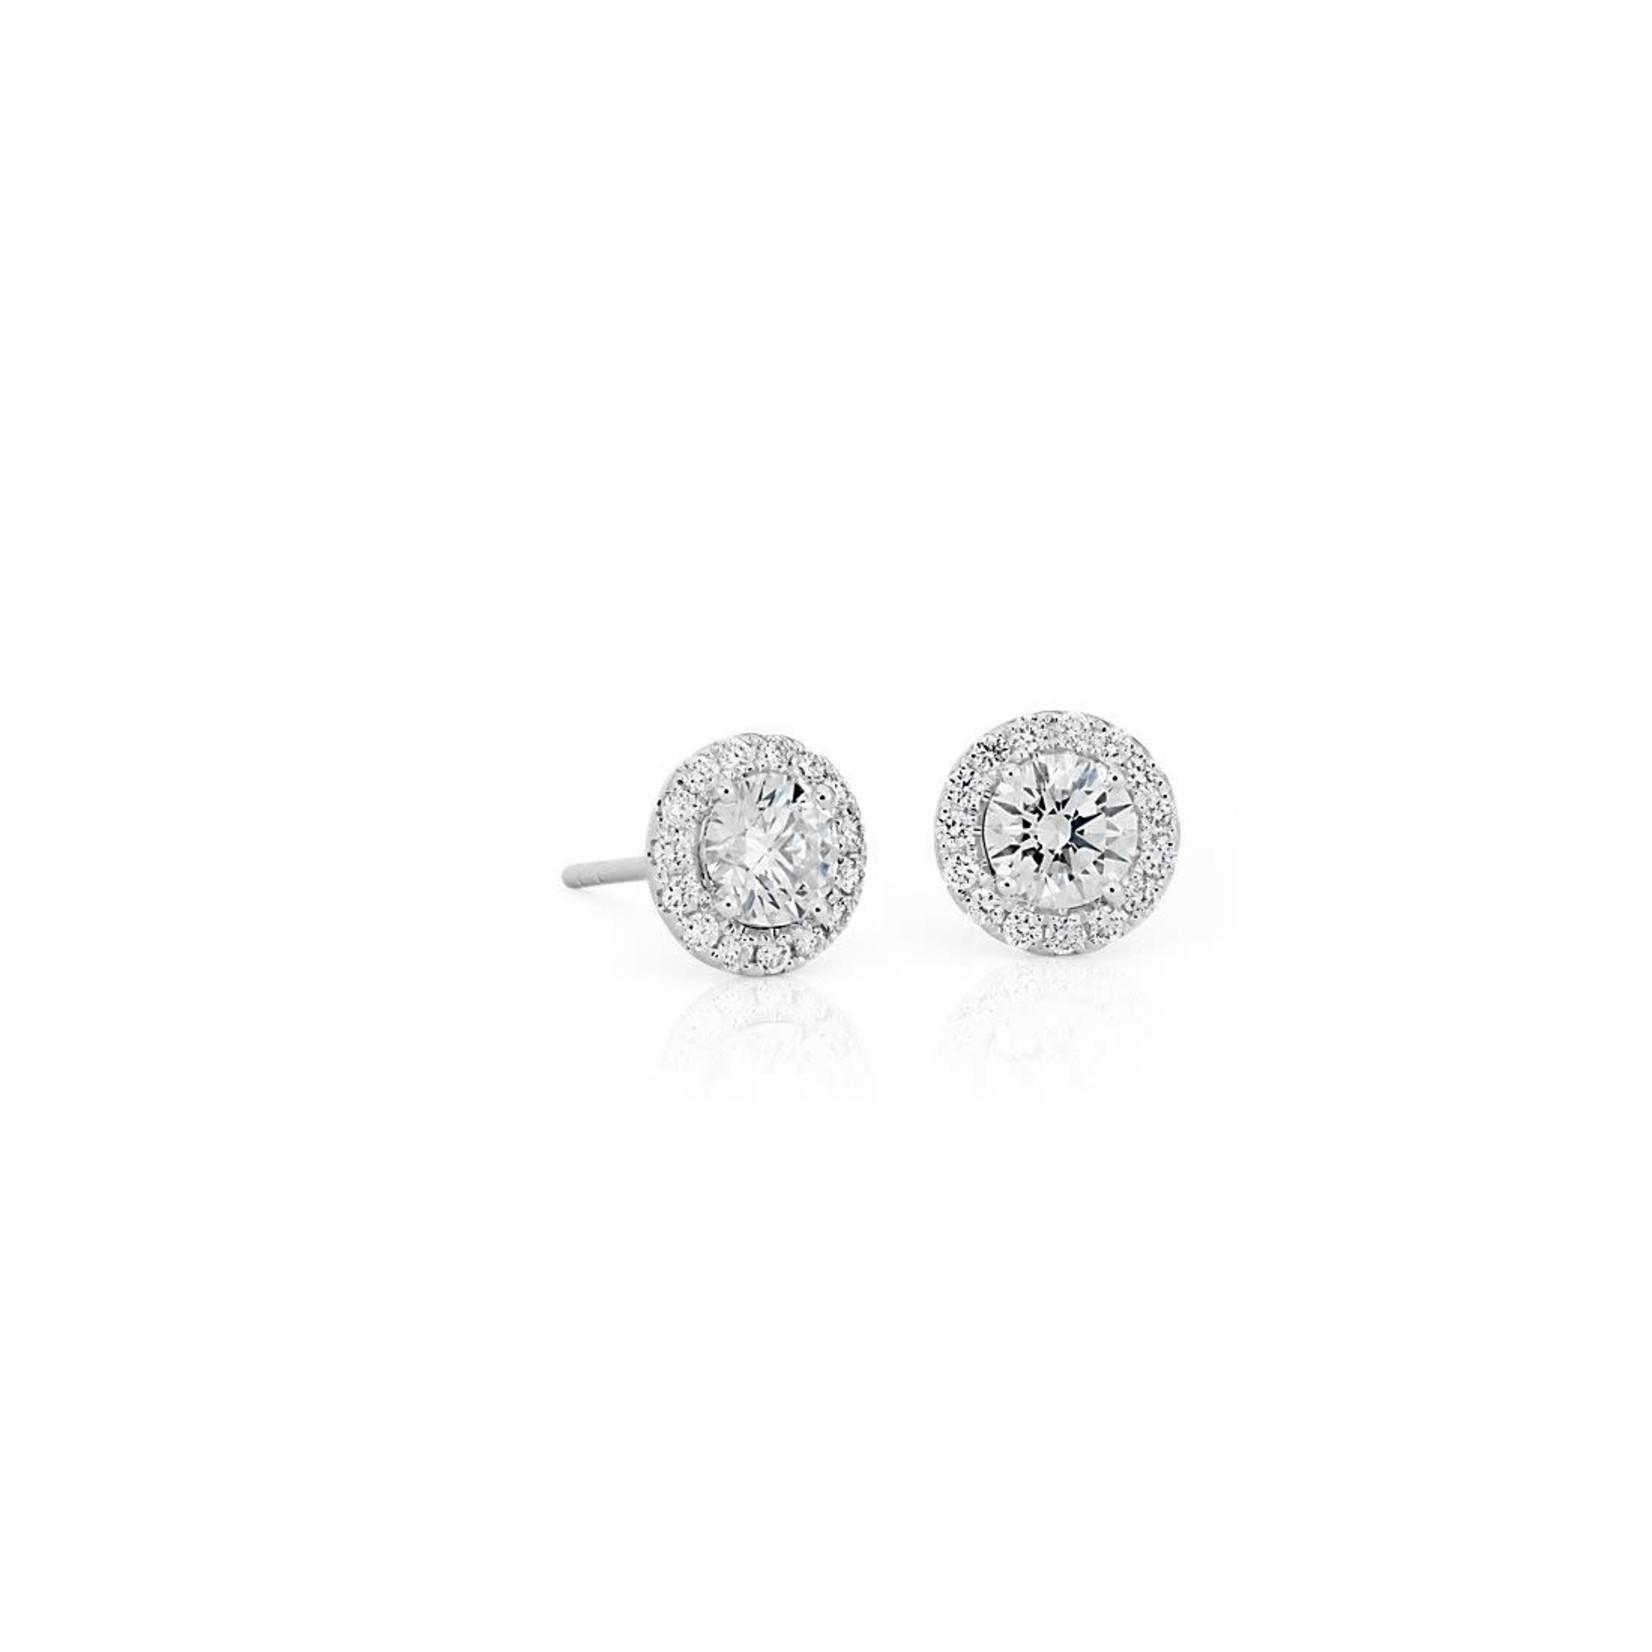 14KW Gold Diamond 1ctw Halo Stud Earrings